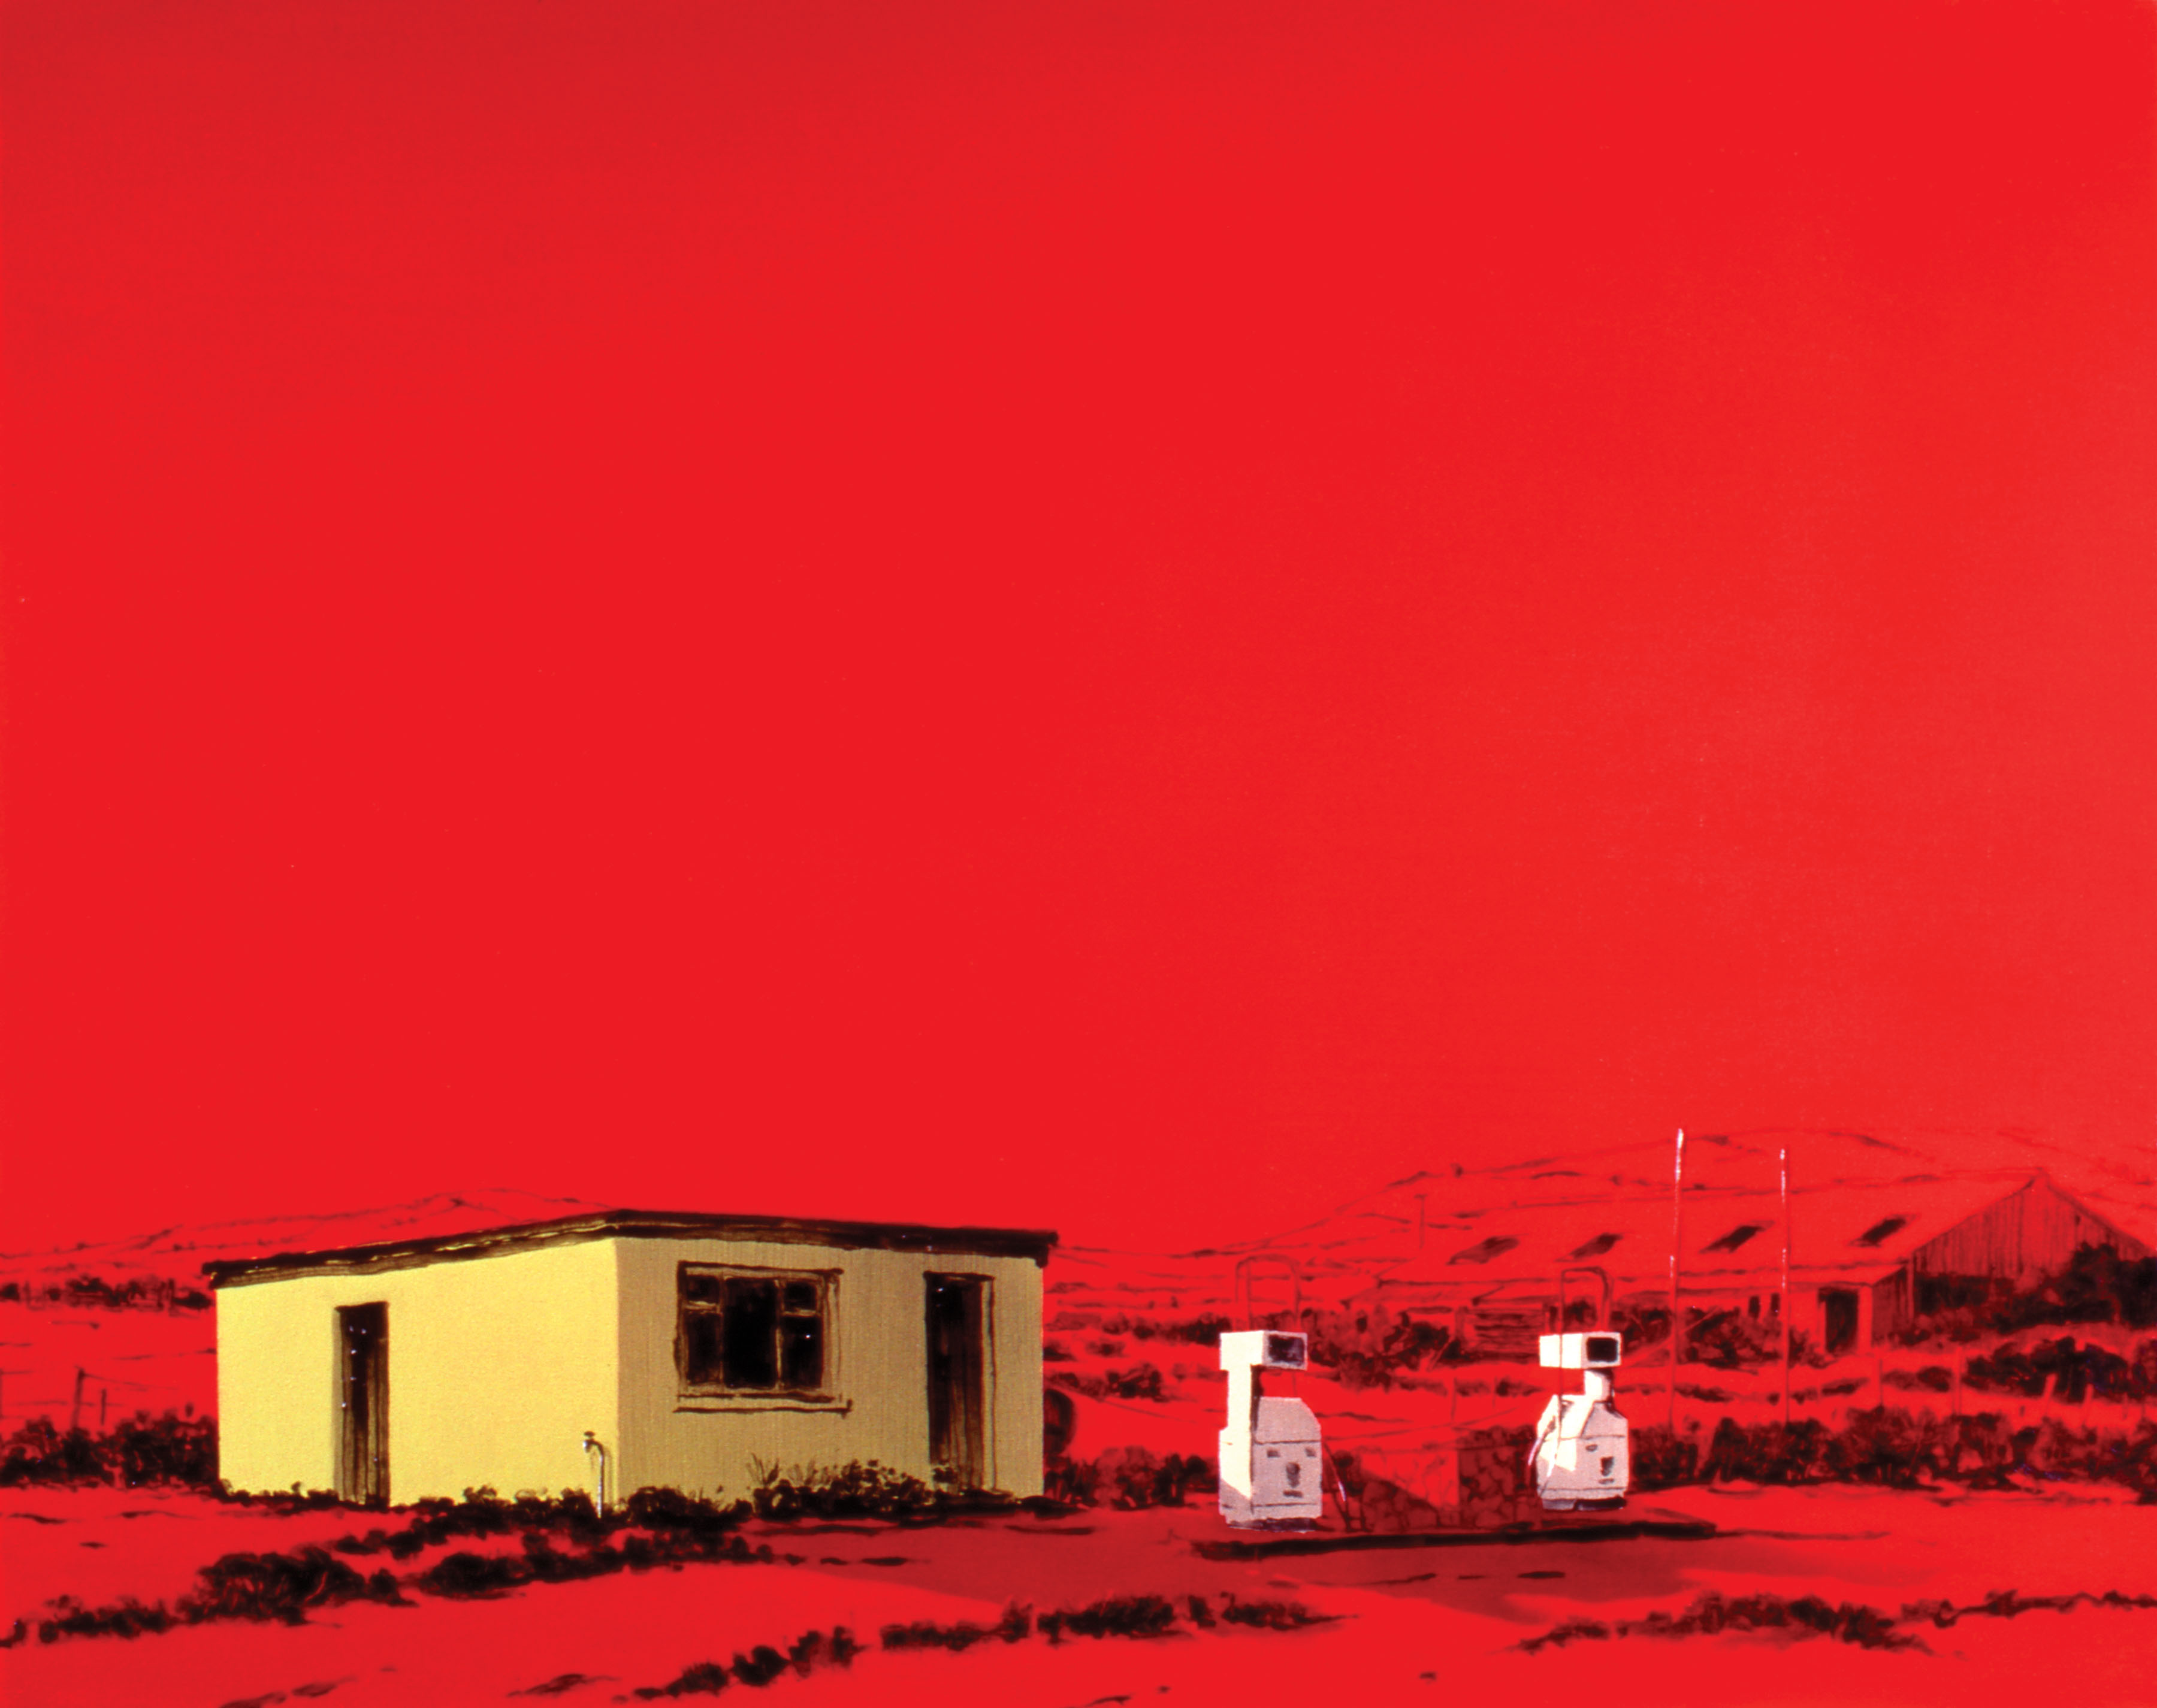 Red Day (Valentia)